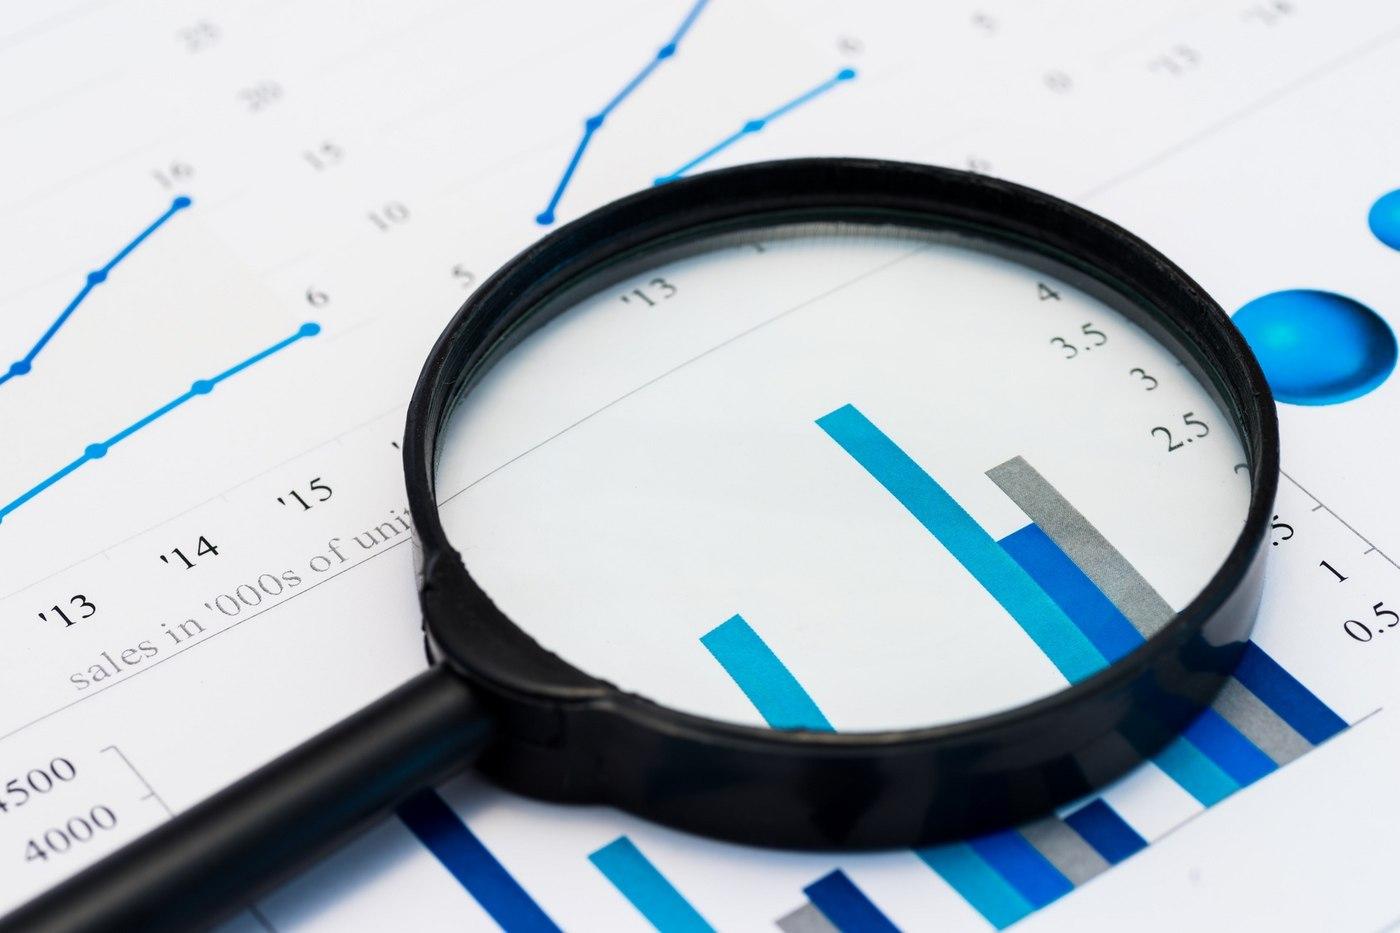 Top five IT Industry NAICS codes Spending Trends